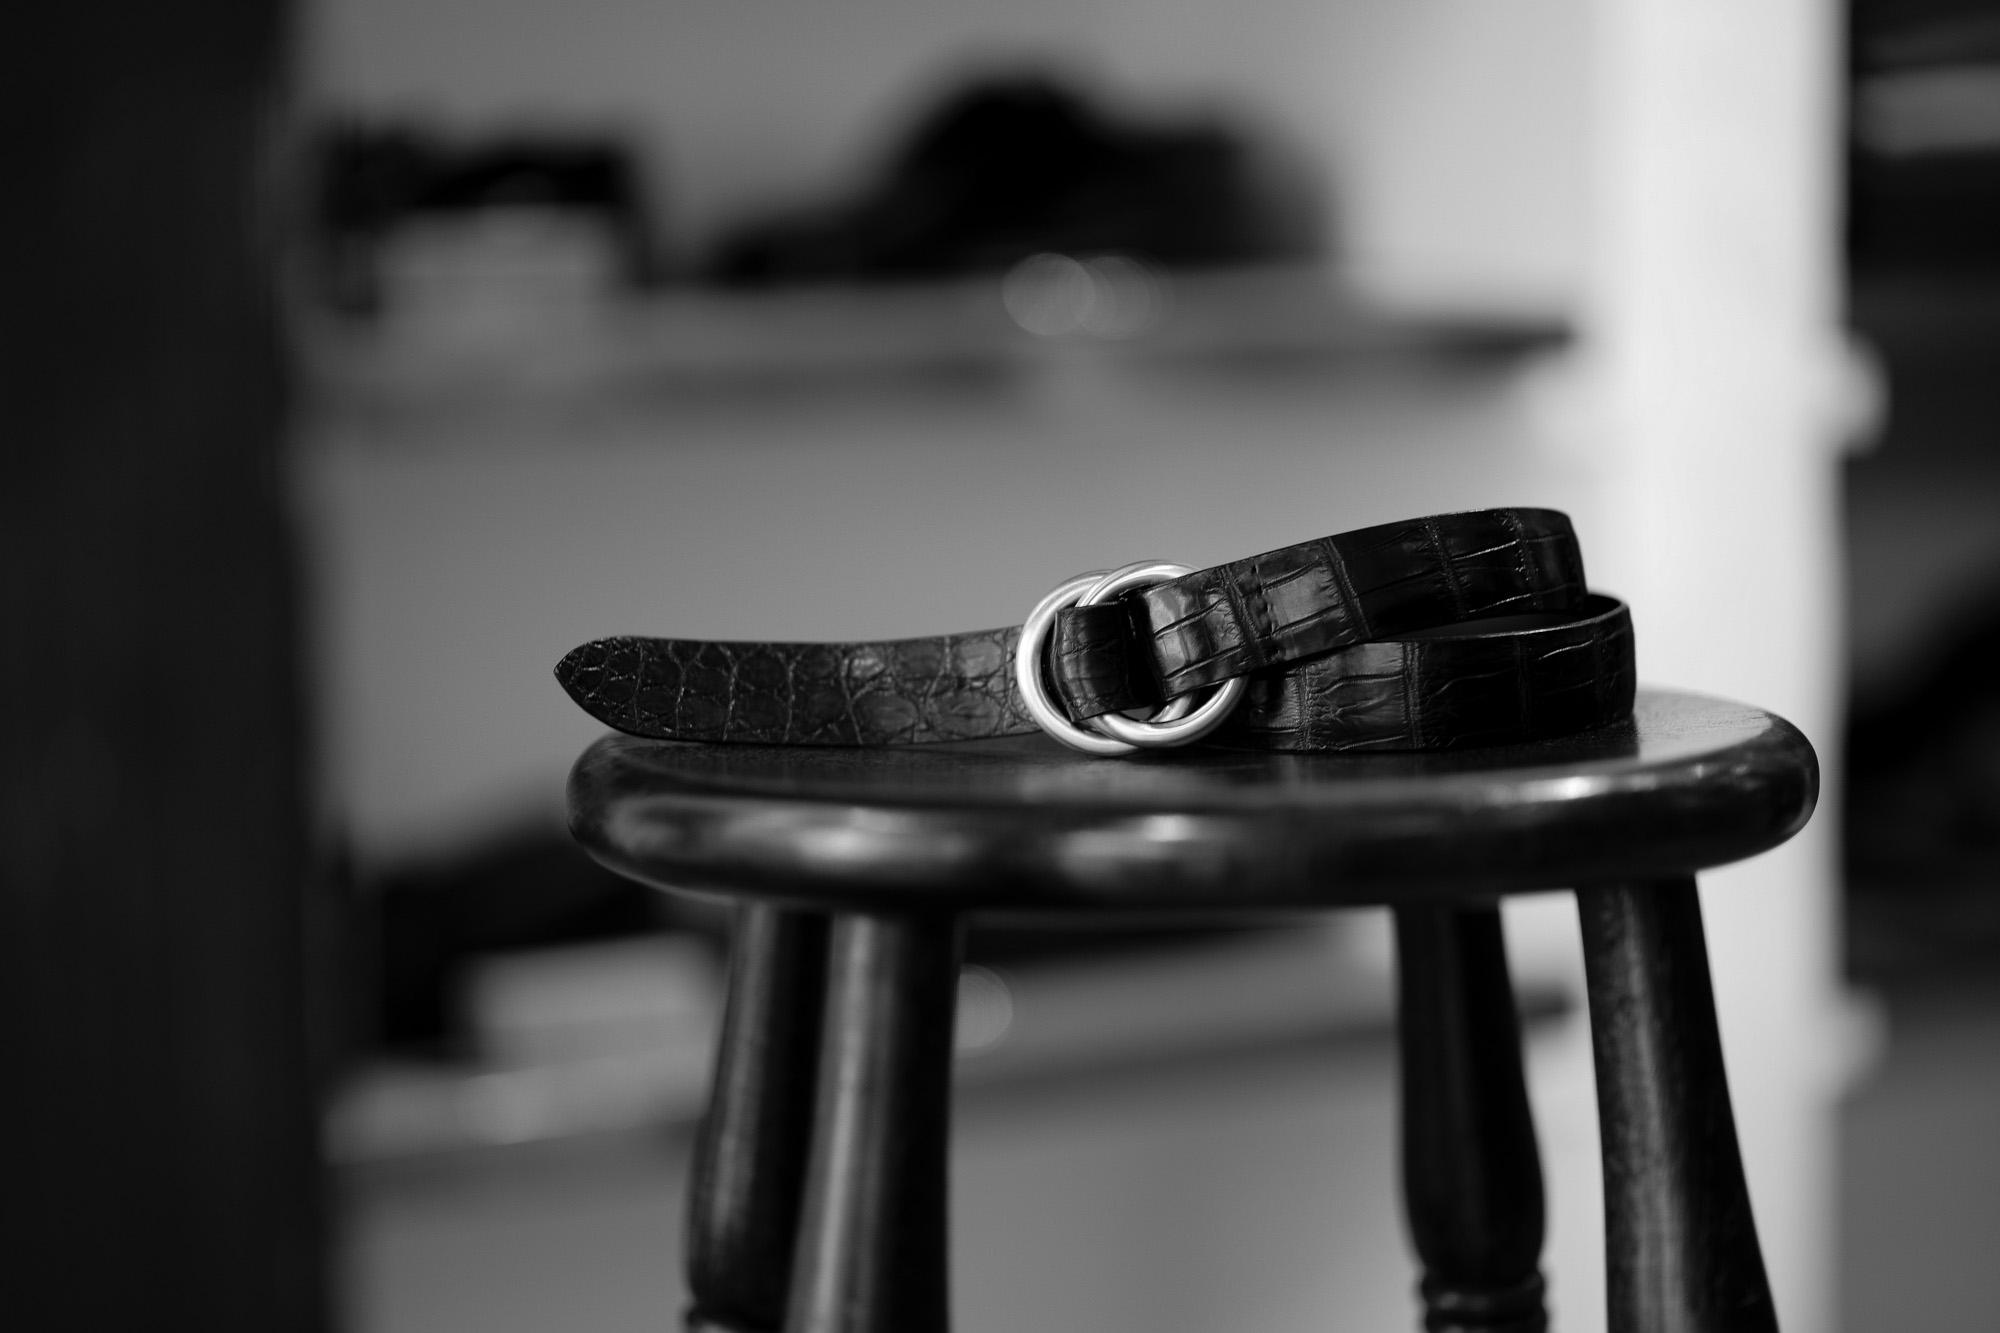 THE SOLE(ザ ソロ) Nile Crocodile Leather SUPREME 30MM ナイルクロコダイル ダブルリング ベルト レザーベルト BLACK(ブラック) 【ご予約受付中】クロコダイル ダブルリングベルト SUPREME 30MM幅 クロコダイル 愛知 名古屋 Alto e Diritto altoediritto アルトエデリット リングベルト MASTER PLAN 神藤 光太郎